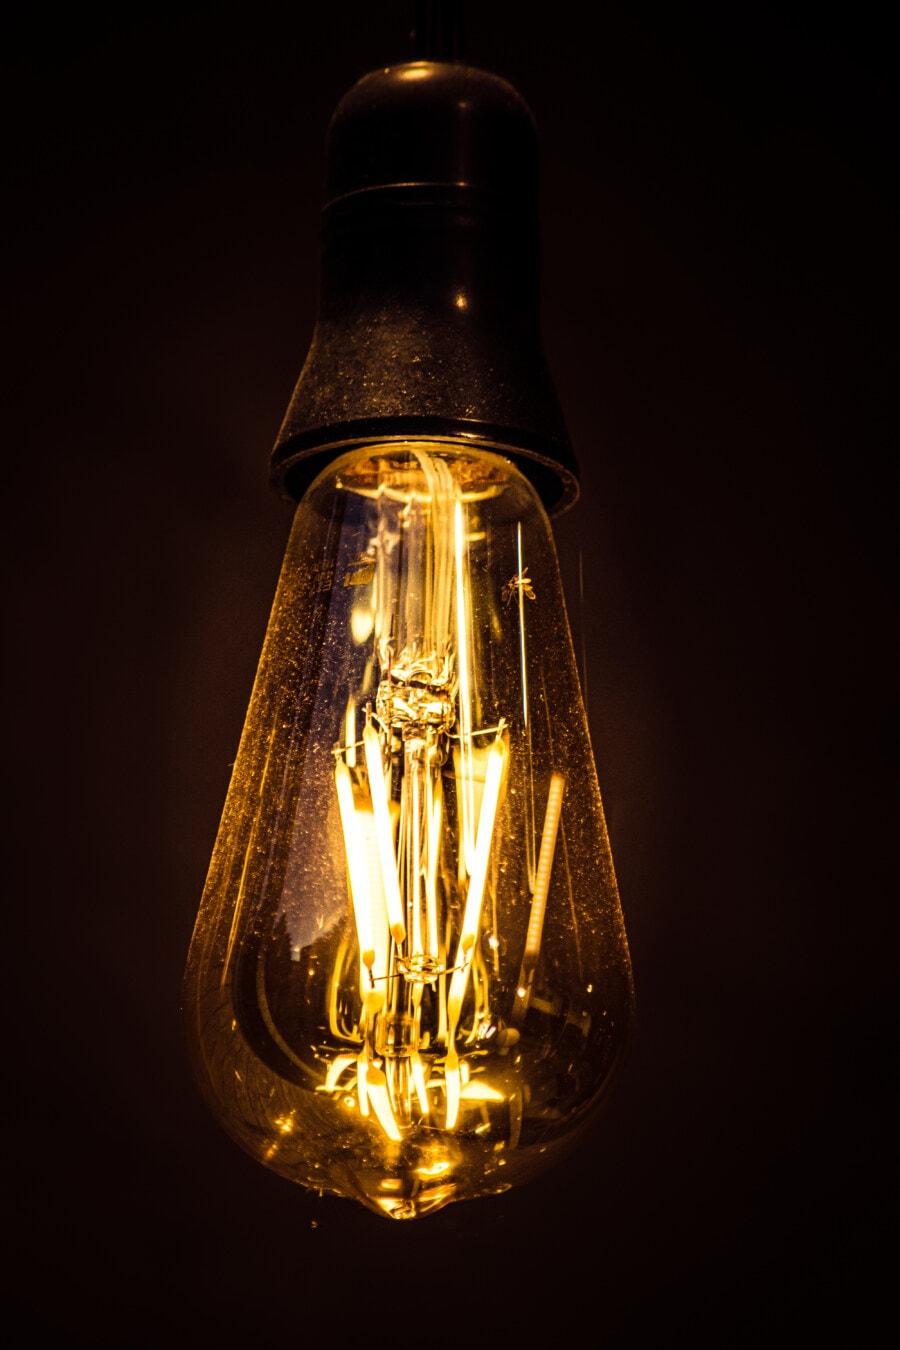 vertikale, lange, Glühbirne, Obelisk, Form, Jahrgang, Strom, Licht, Spannung, Glas